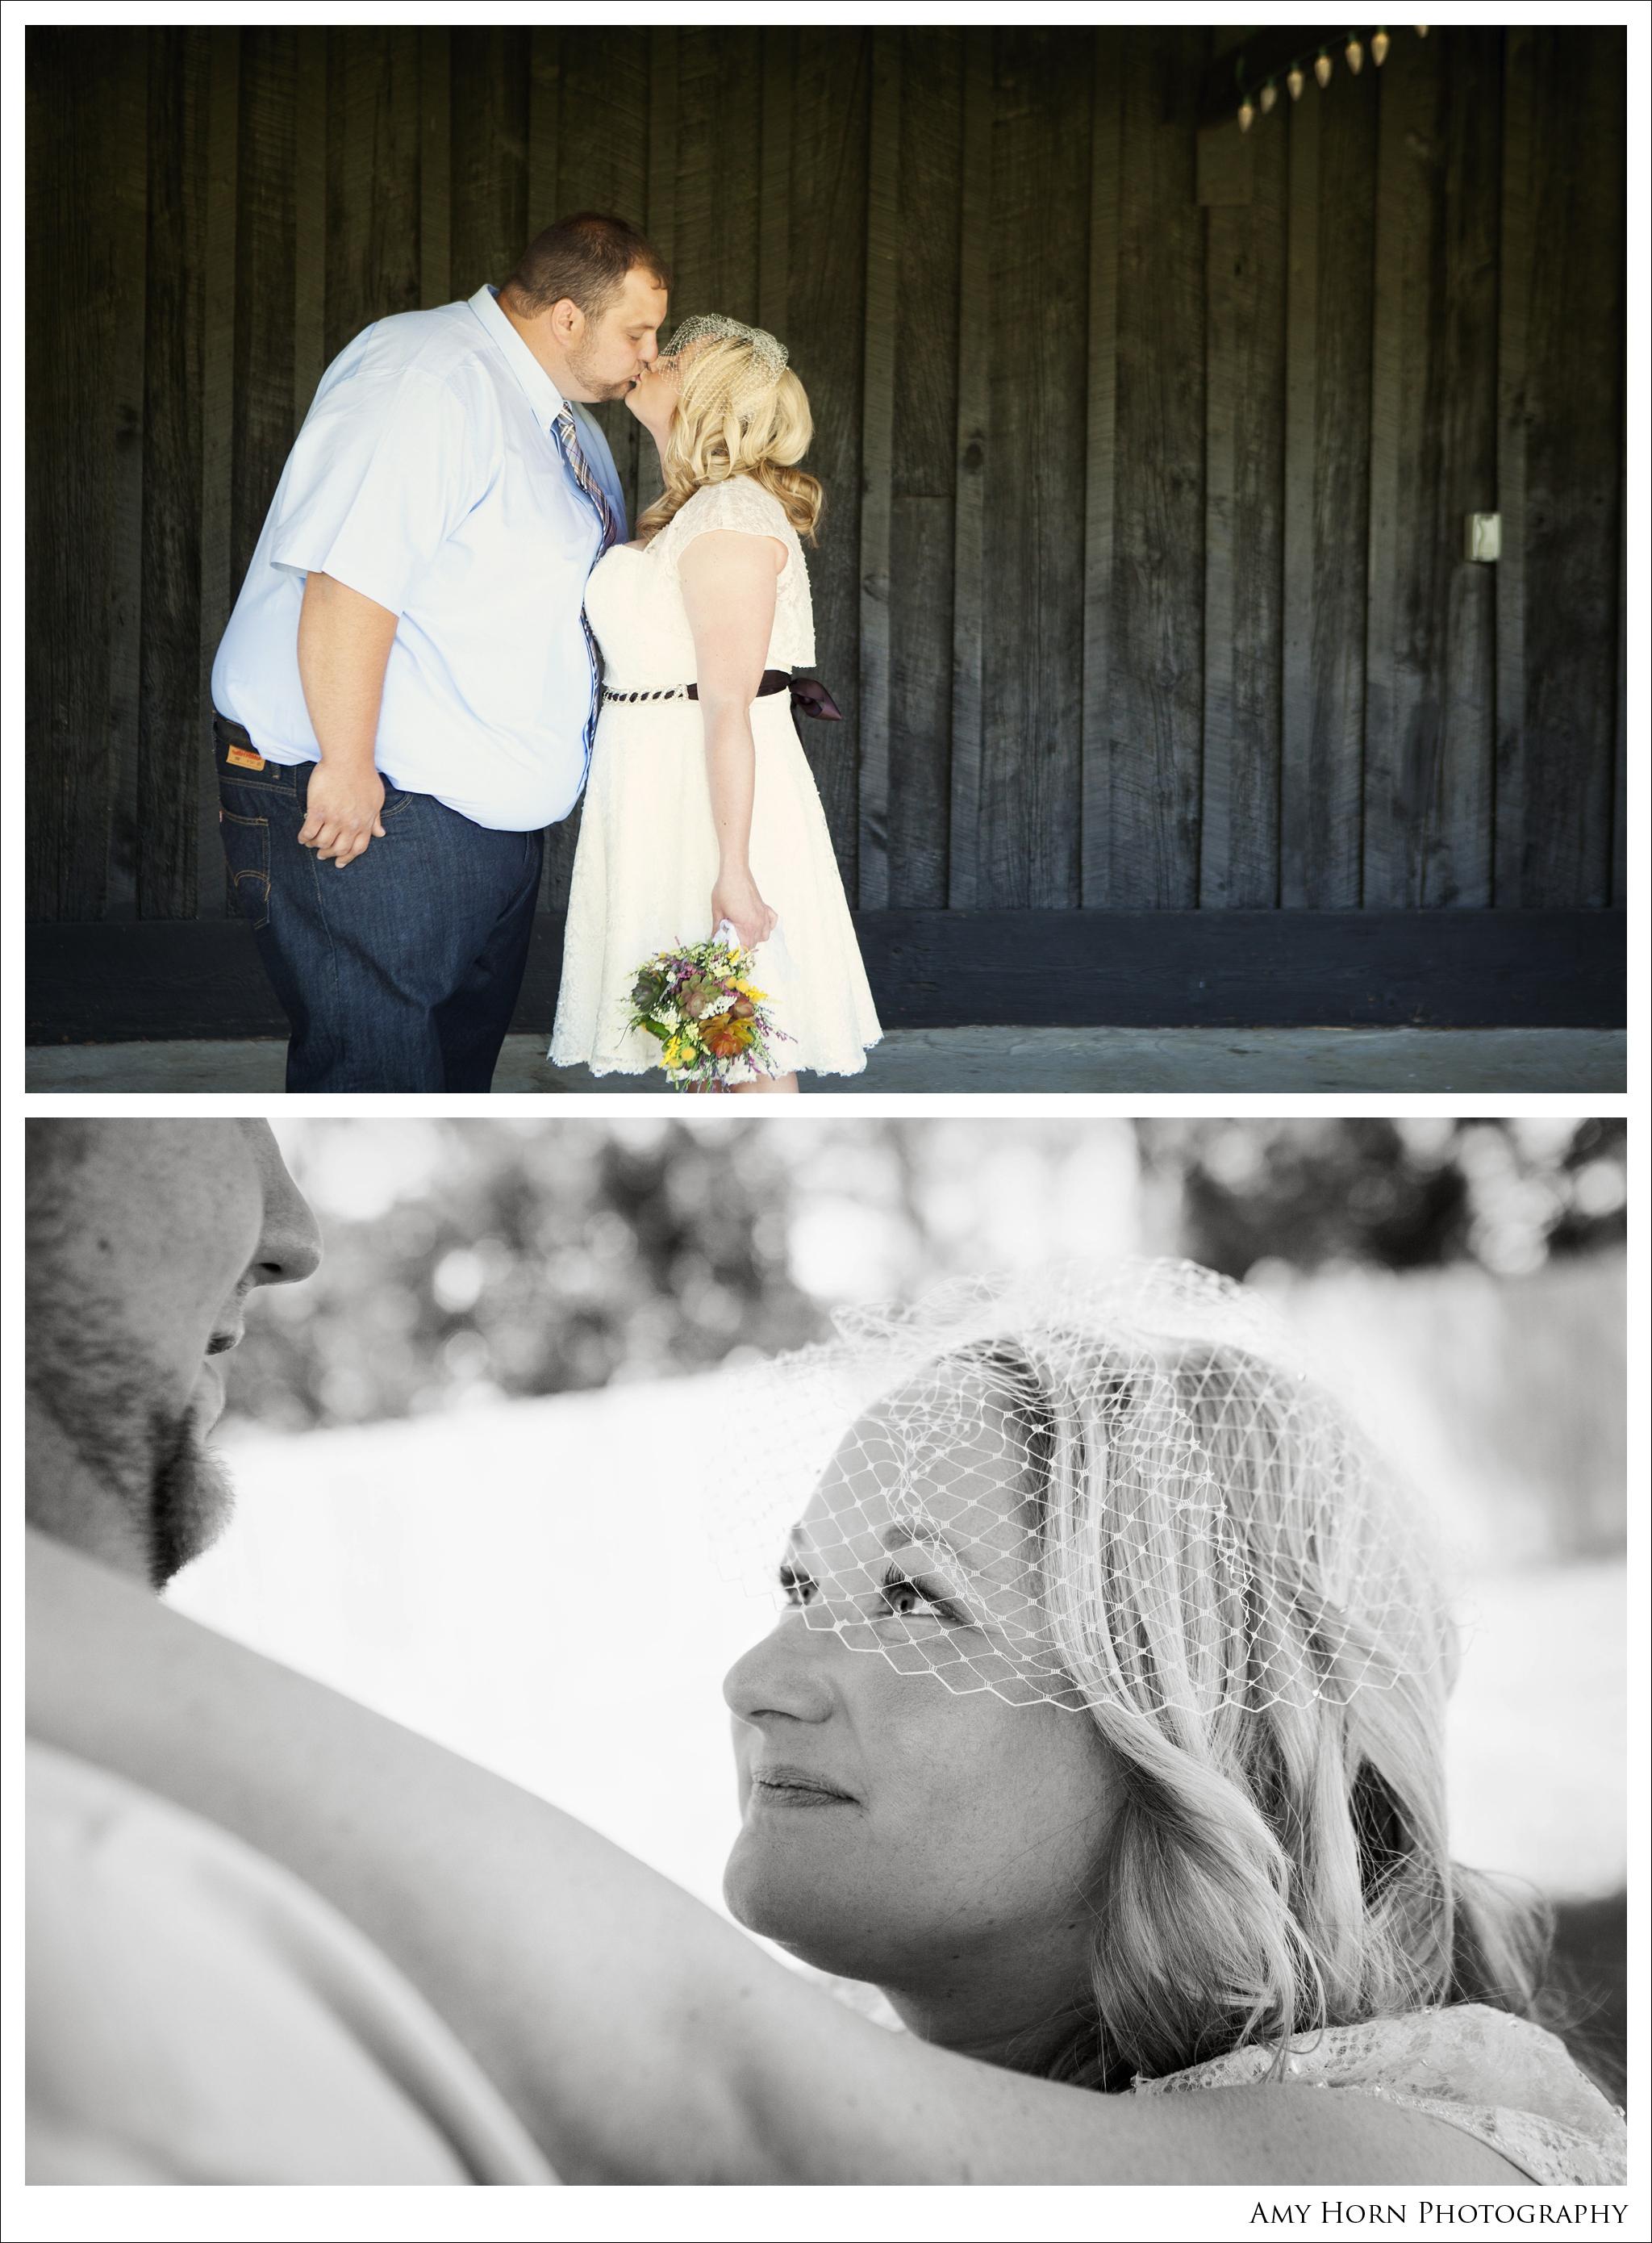 cincinnati wedding photographer, lawrenceburg indiana wedding photographer, aurora indiana engagement, dillsboro indiana, barn wedding, madison indiana wedding, photographer, batesville indiana photographer038.jpg